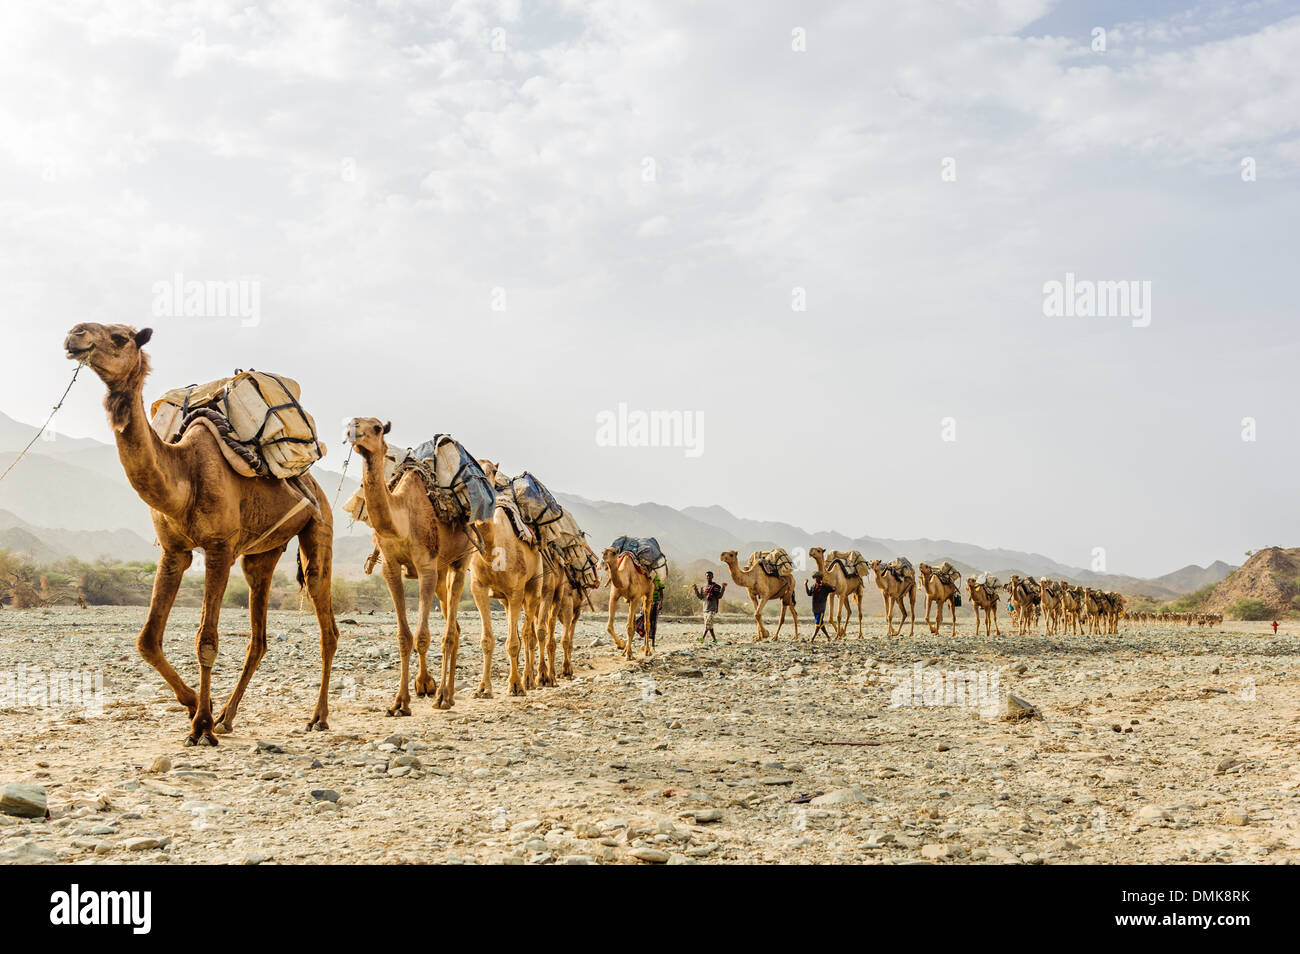 Brilliant Sahara Desert Caravan Camel Caravan In Libyan Desert